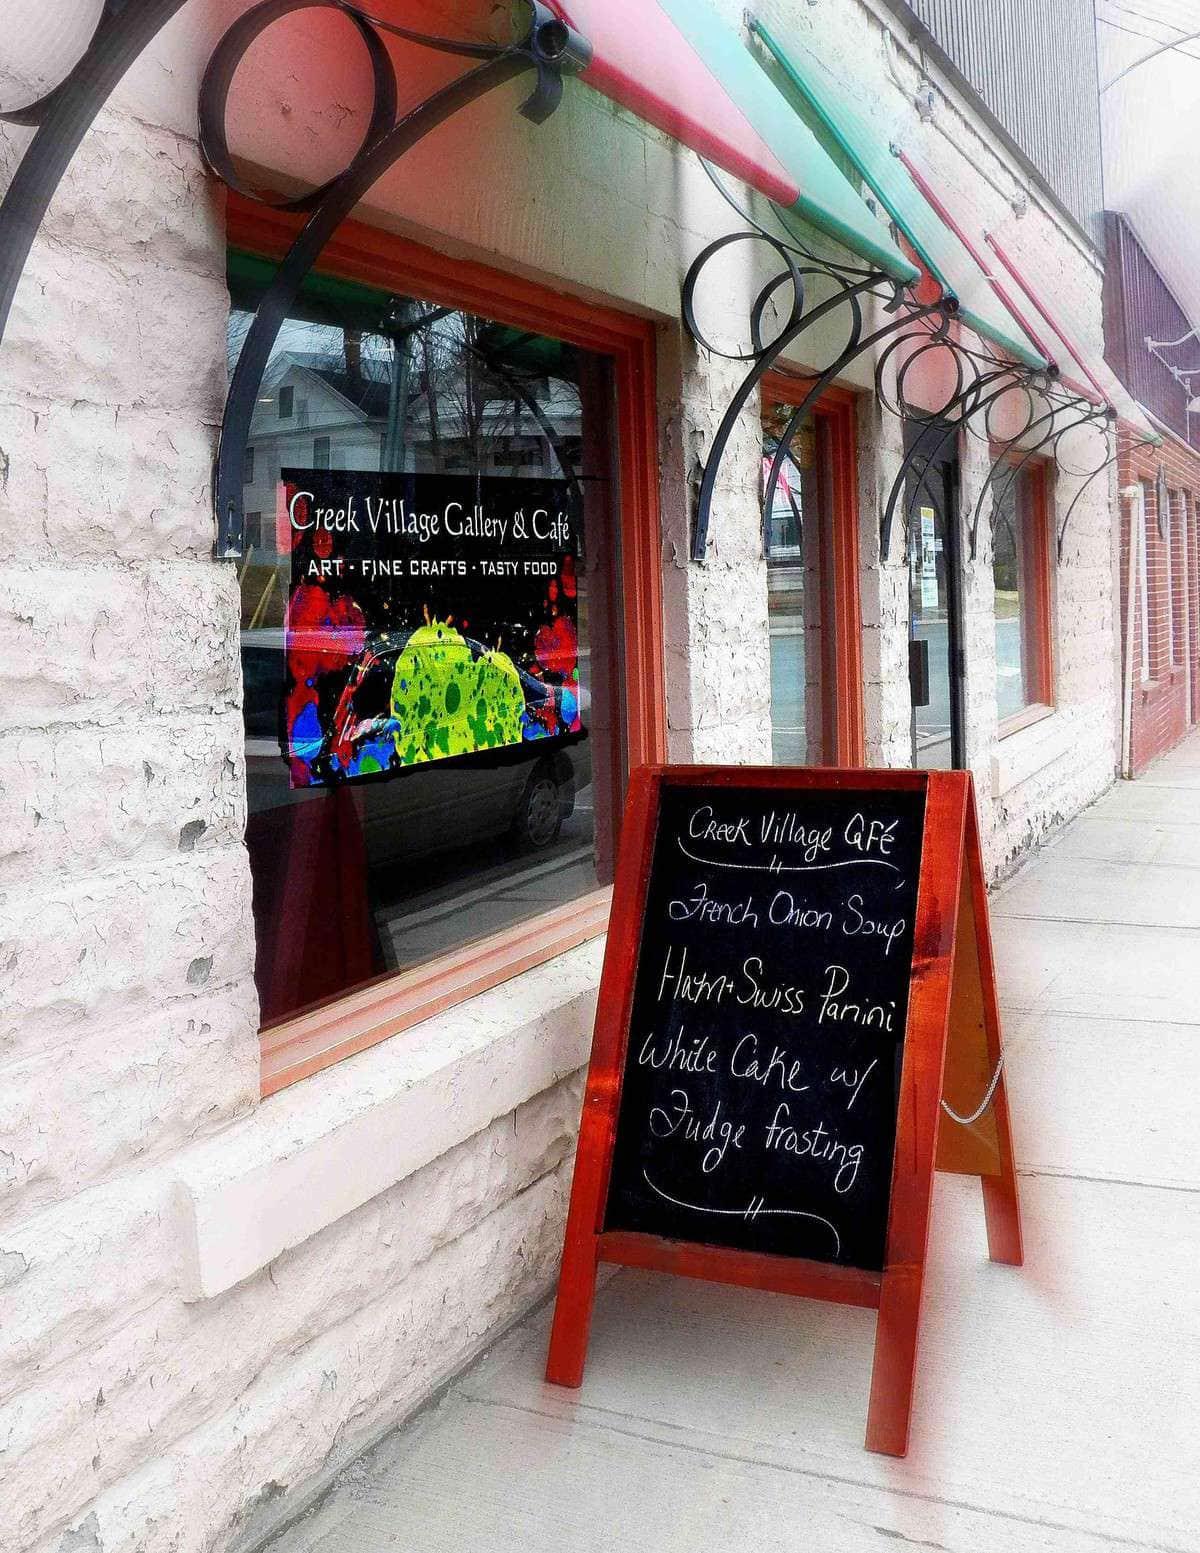 Creek Village Gallery & Cafe